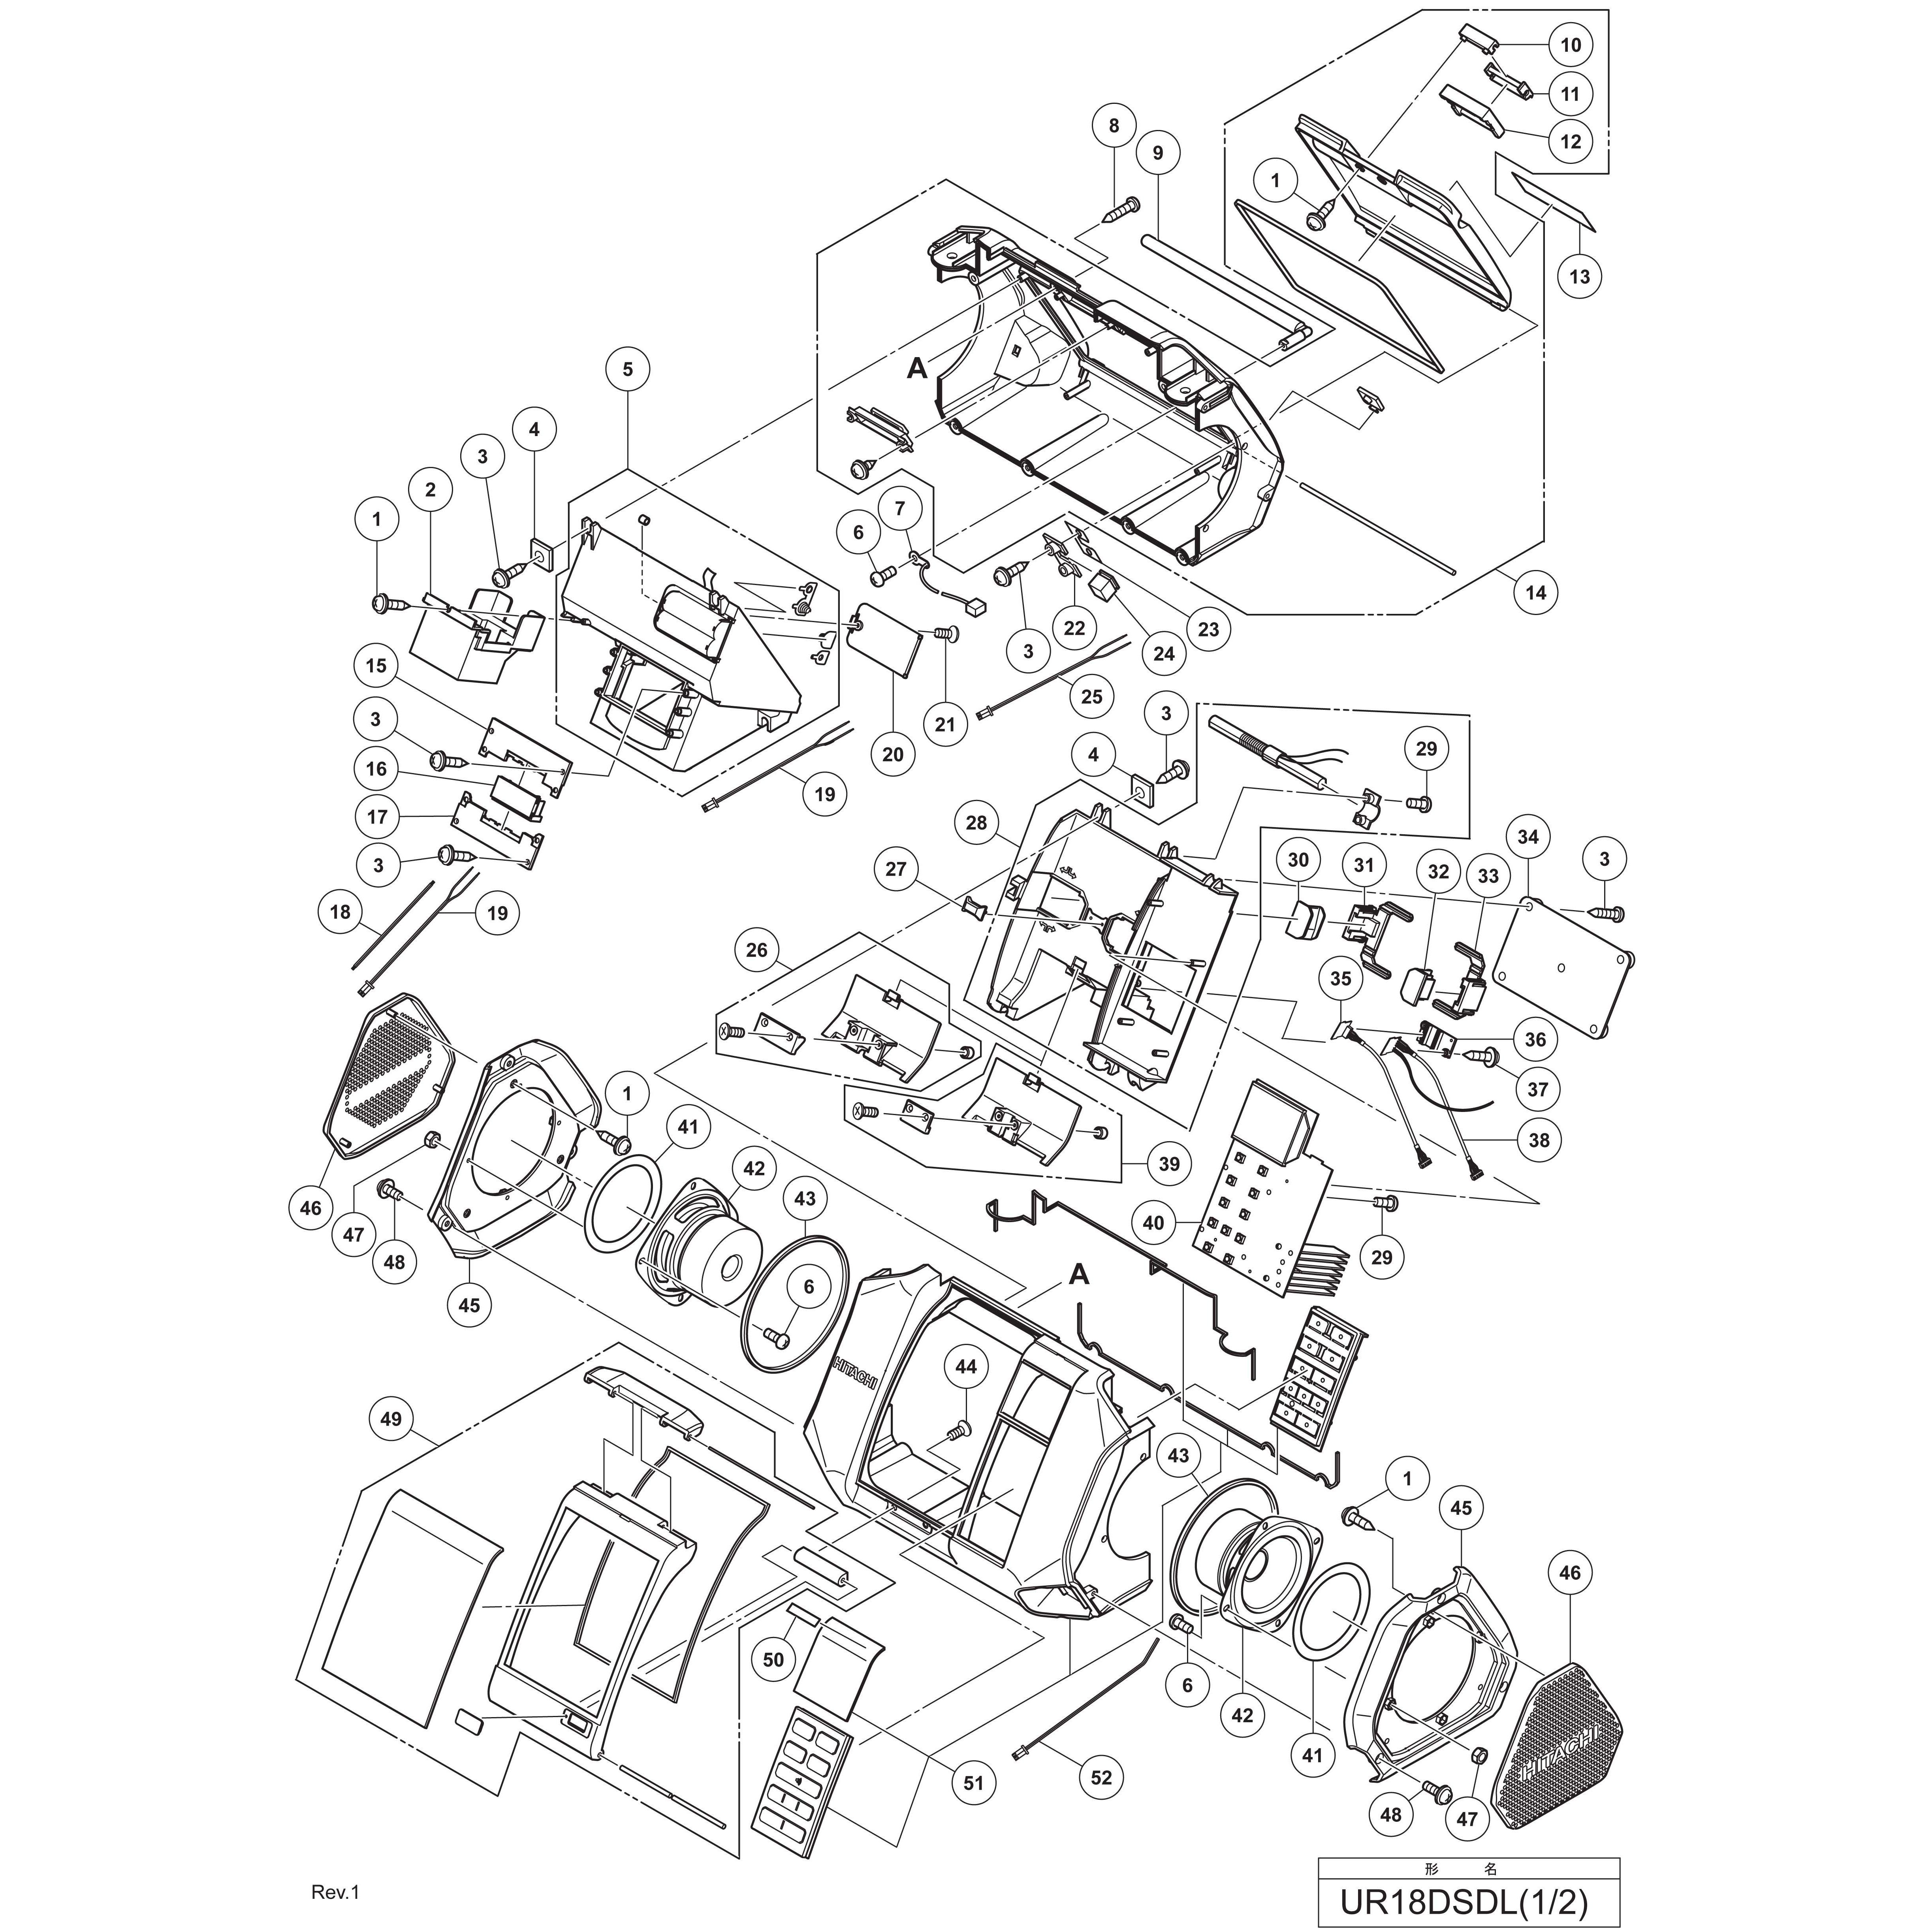 Buy A Hitachi UR18DSDL Spare part or Replacement part for